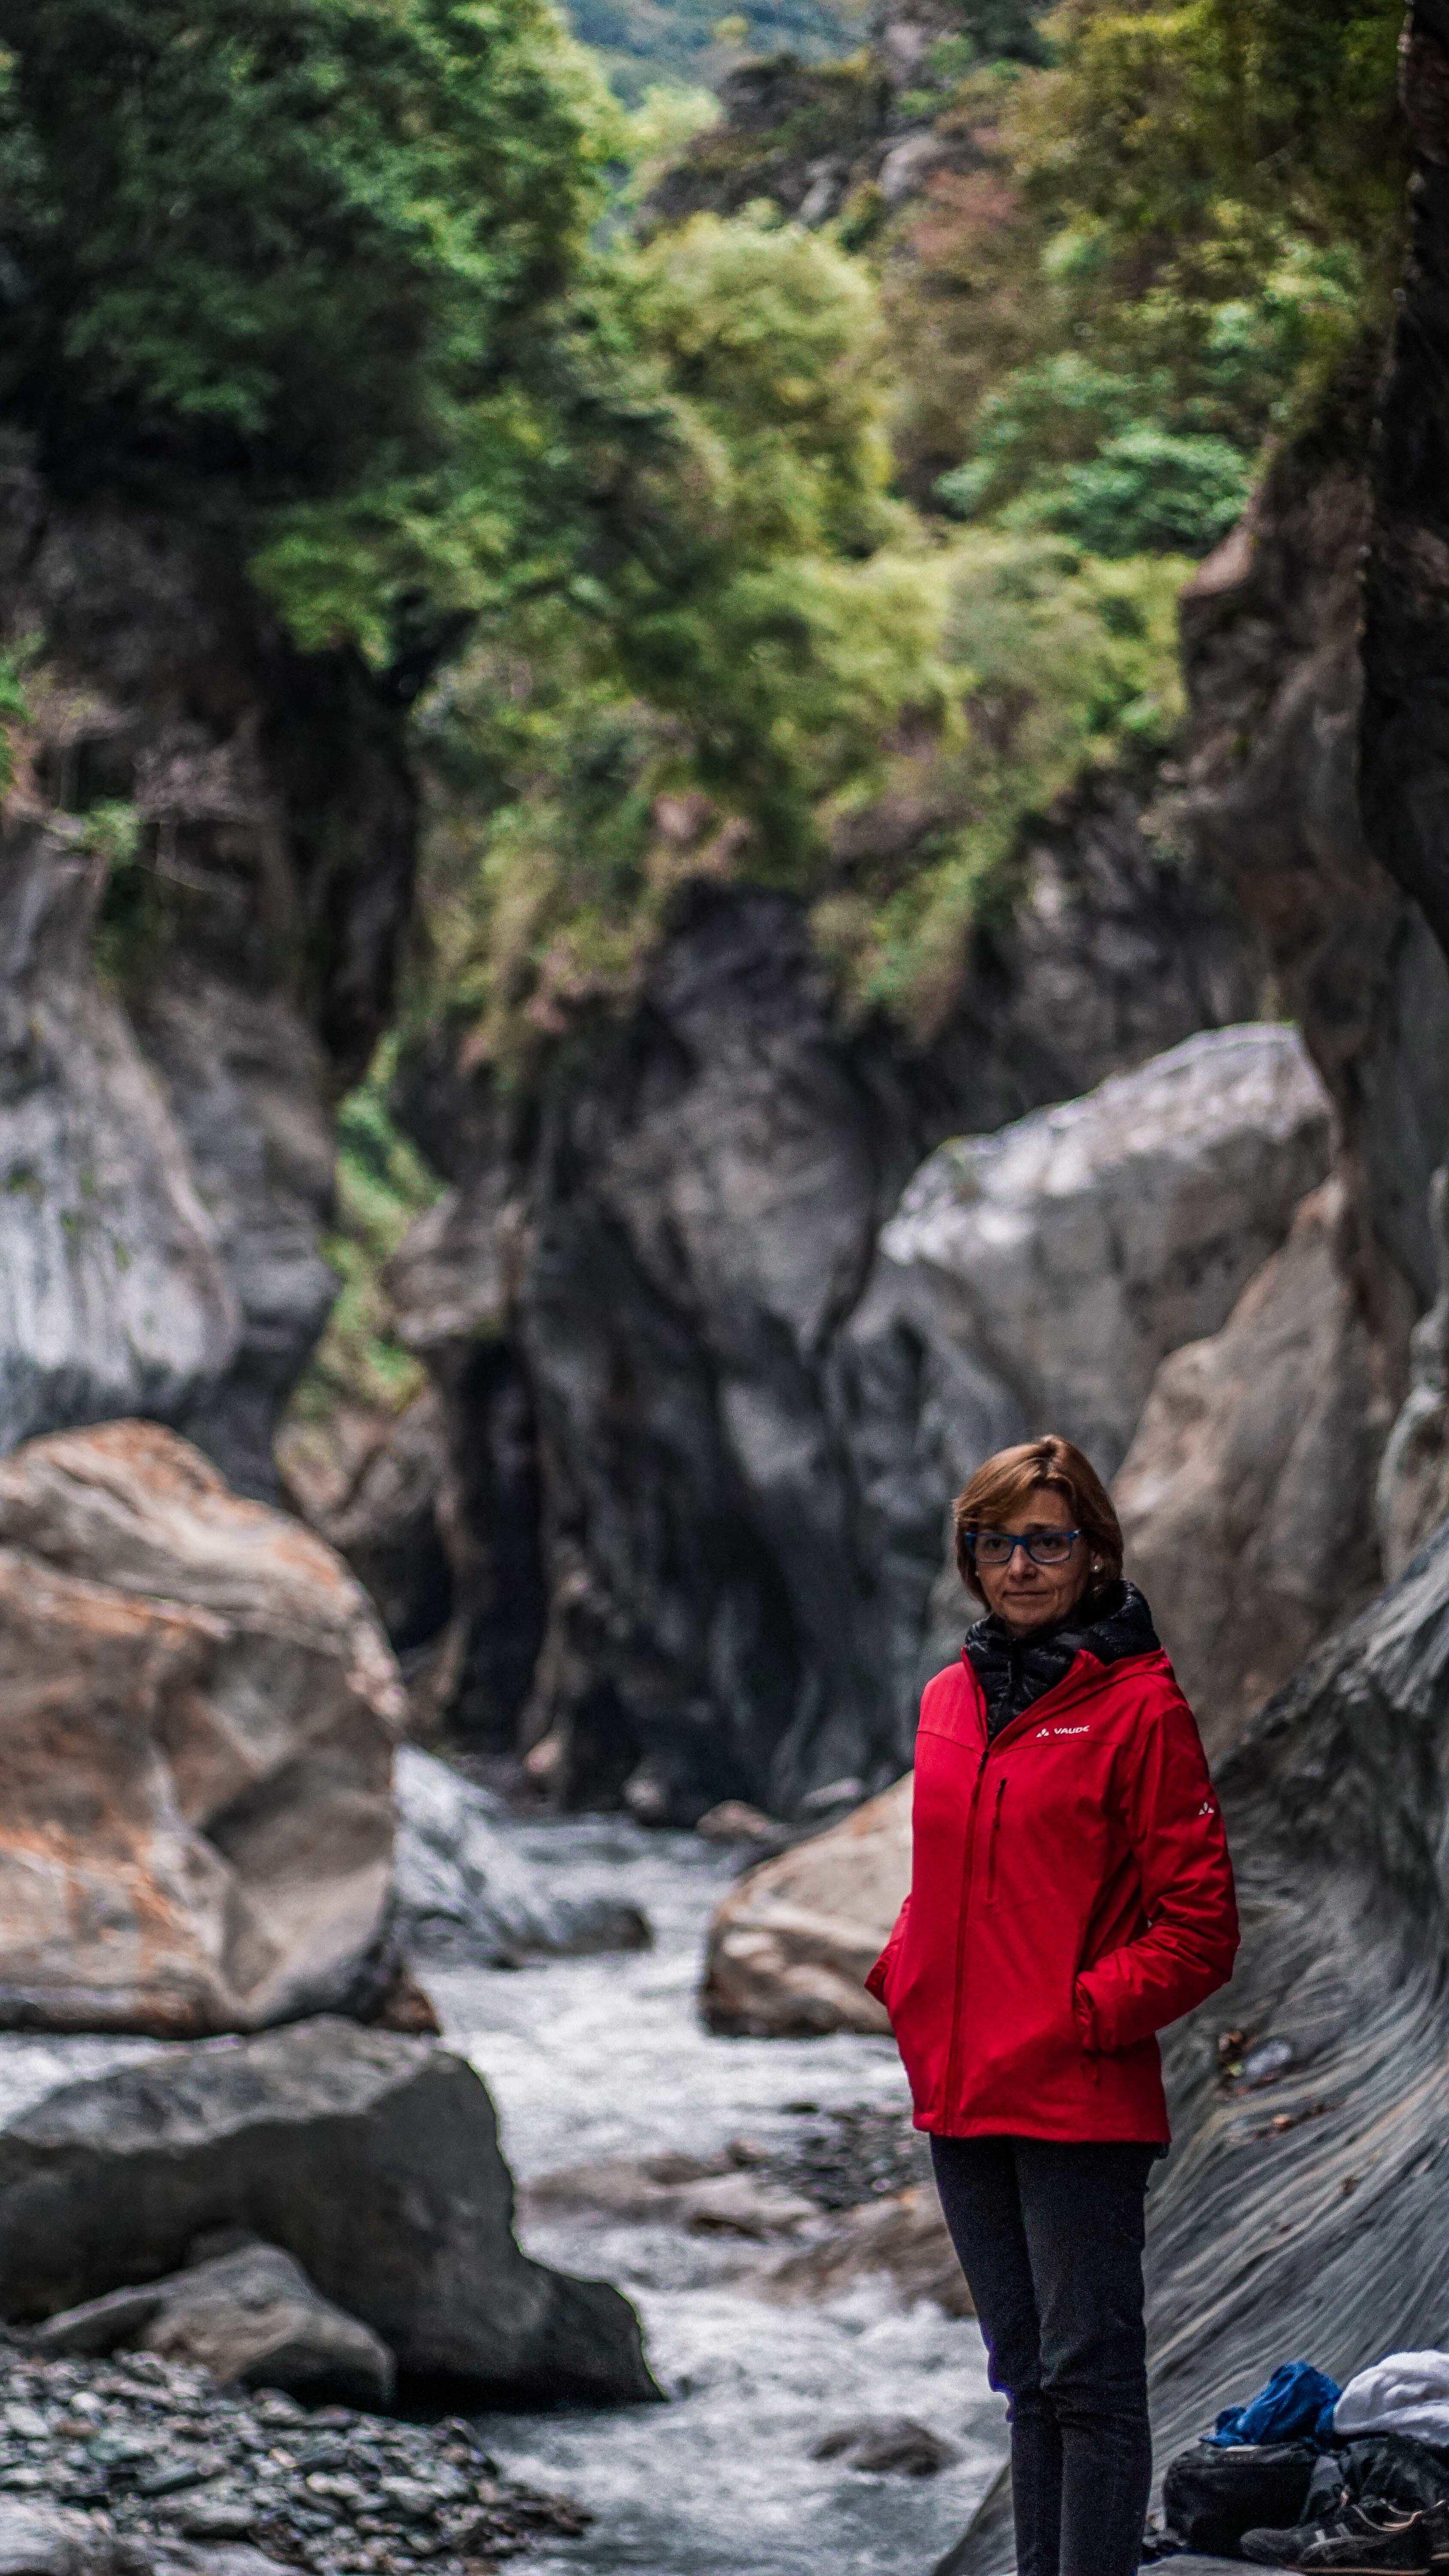 pol_tarres_adventures_taiwan_verticals-16.jpg